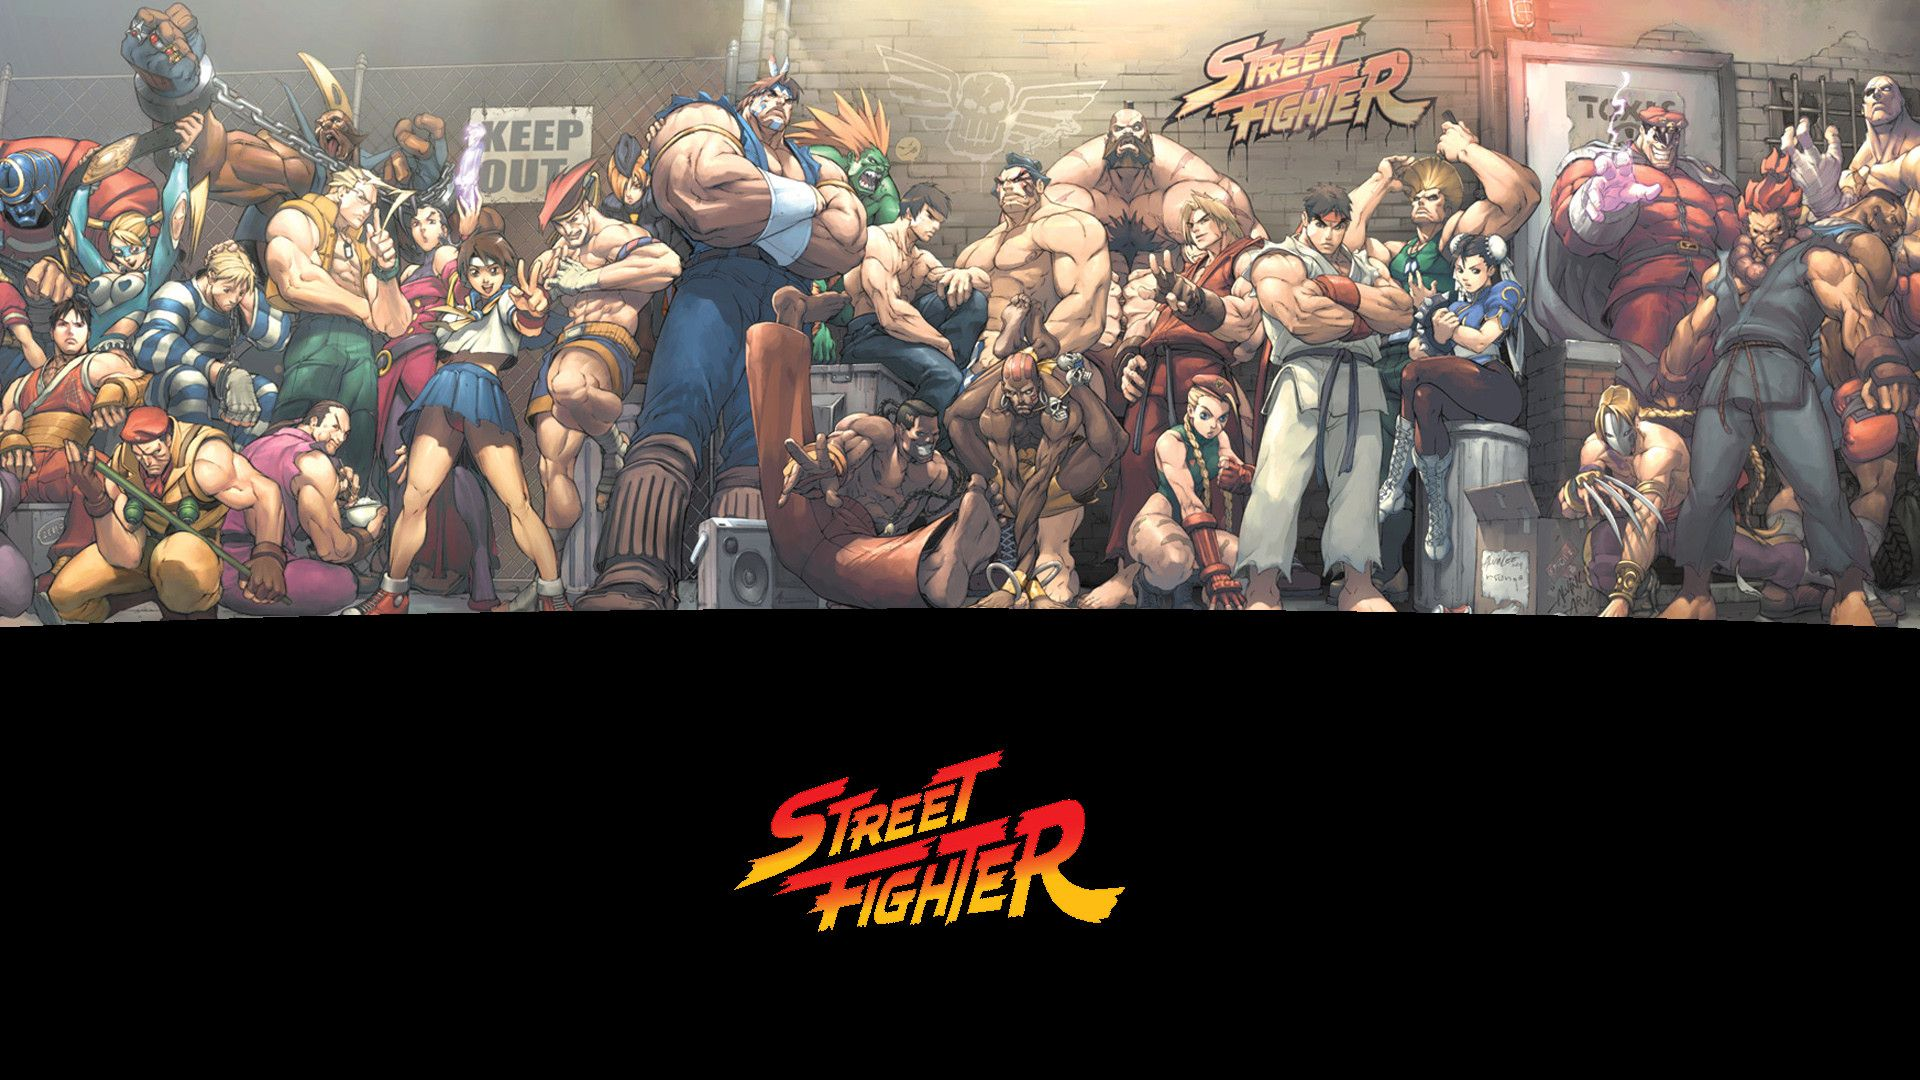 49+] Street Fighter 2 Wallpaper on WallpaperSafari